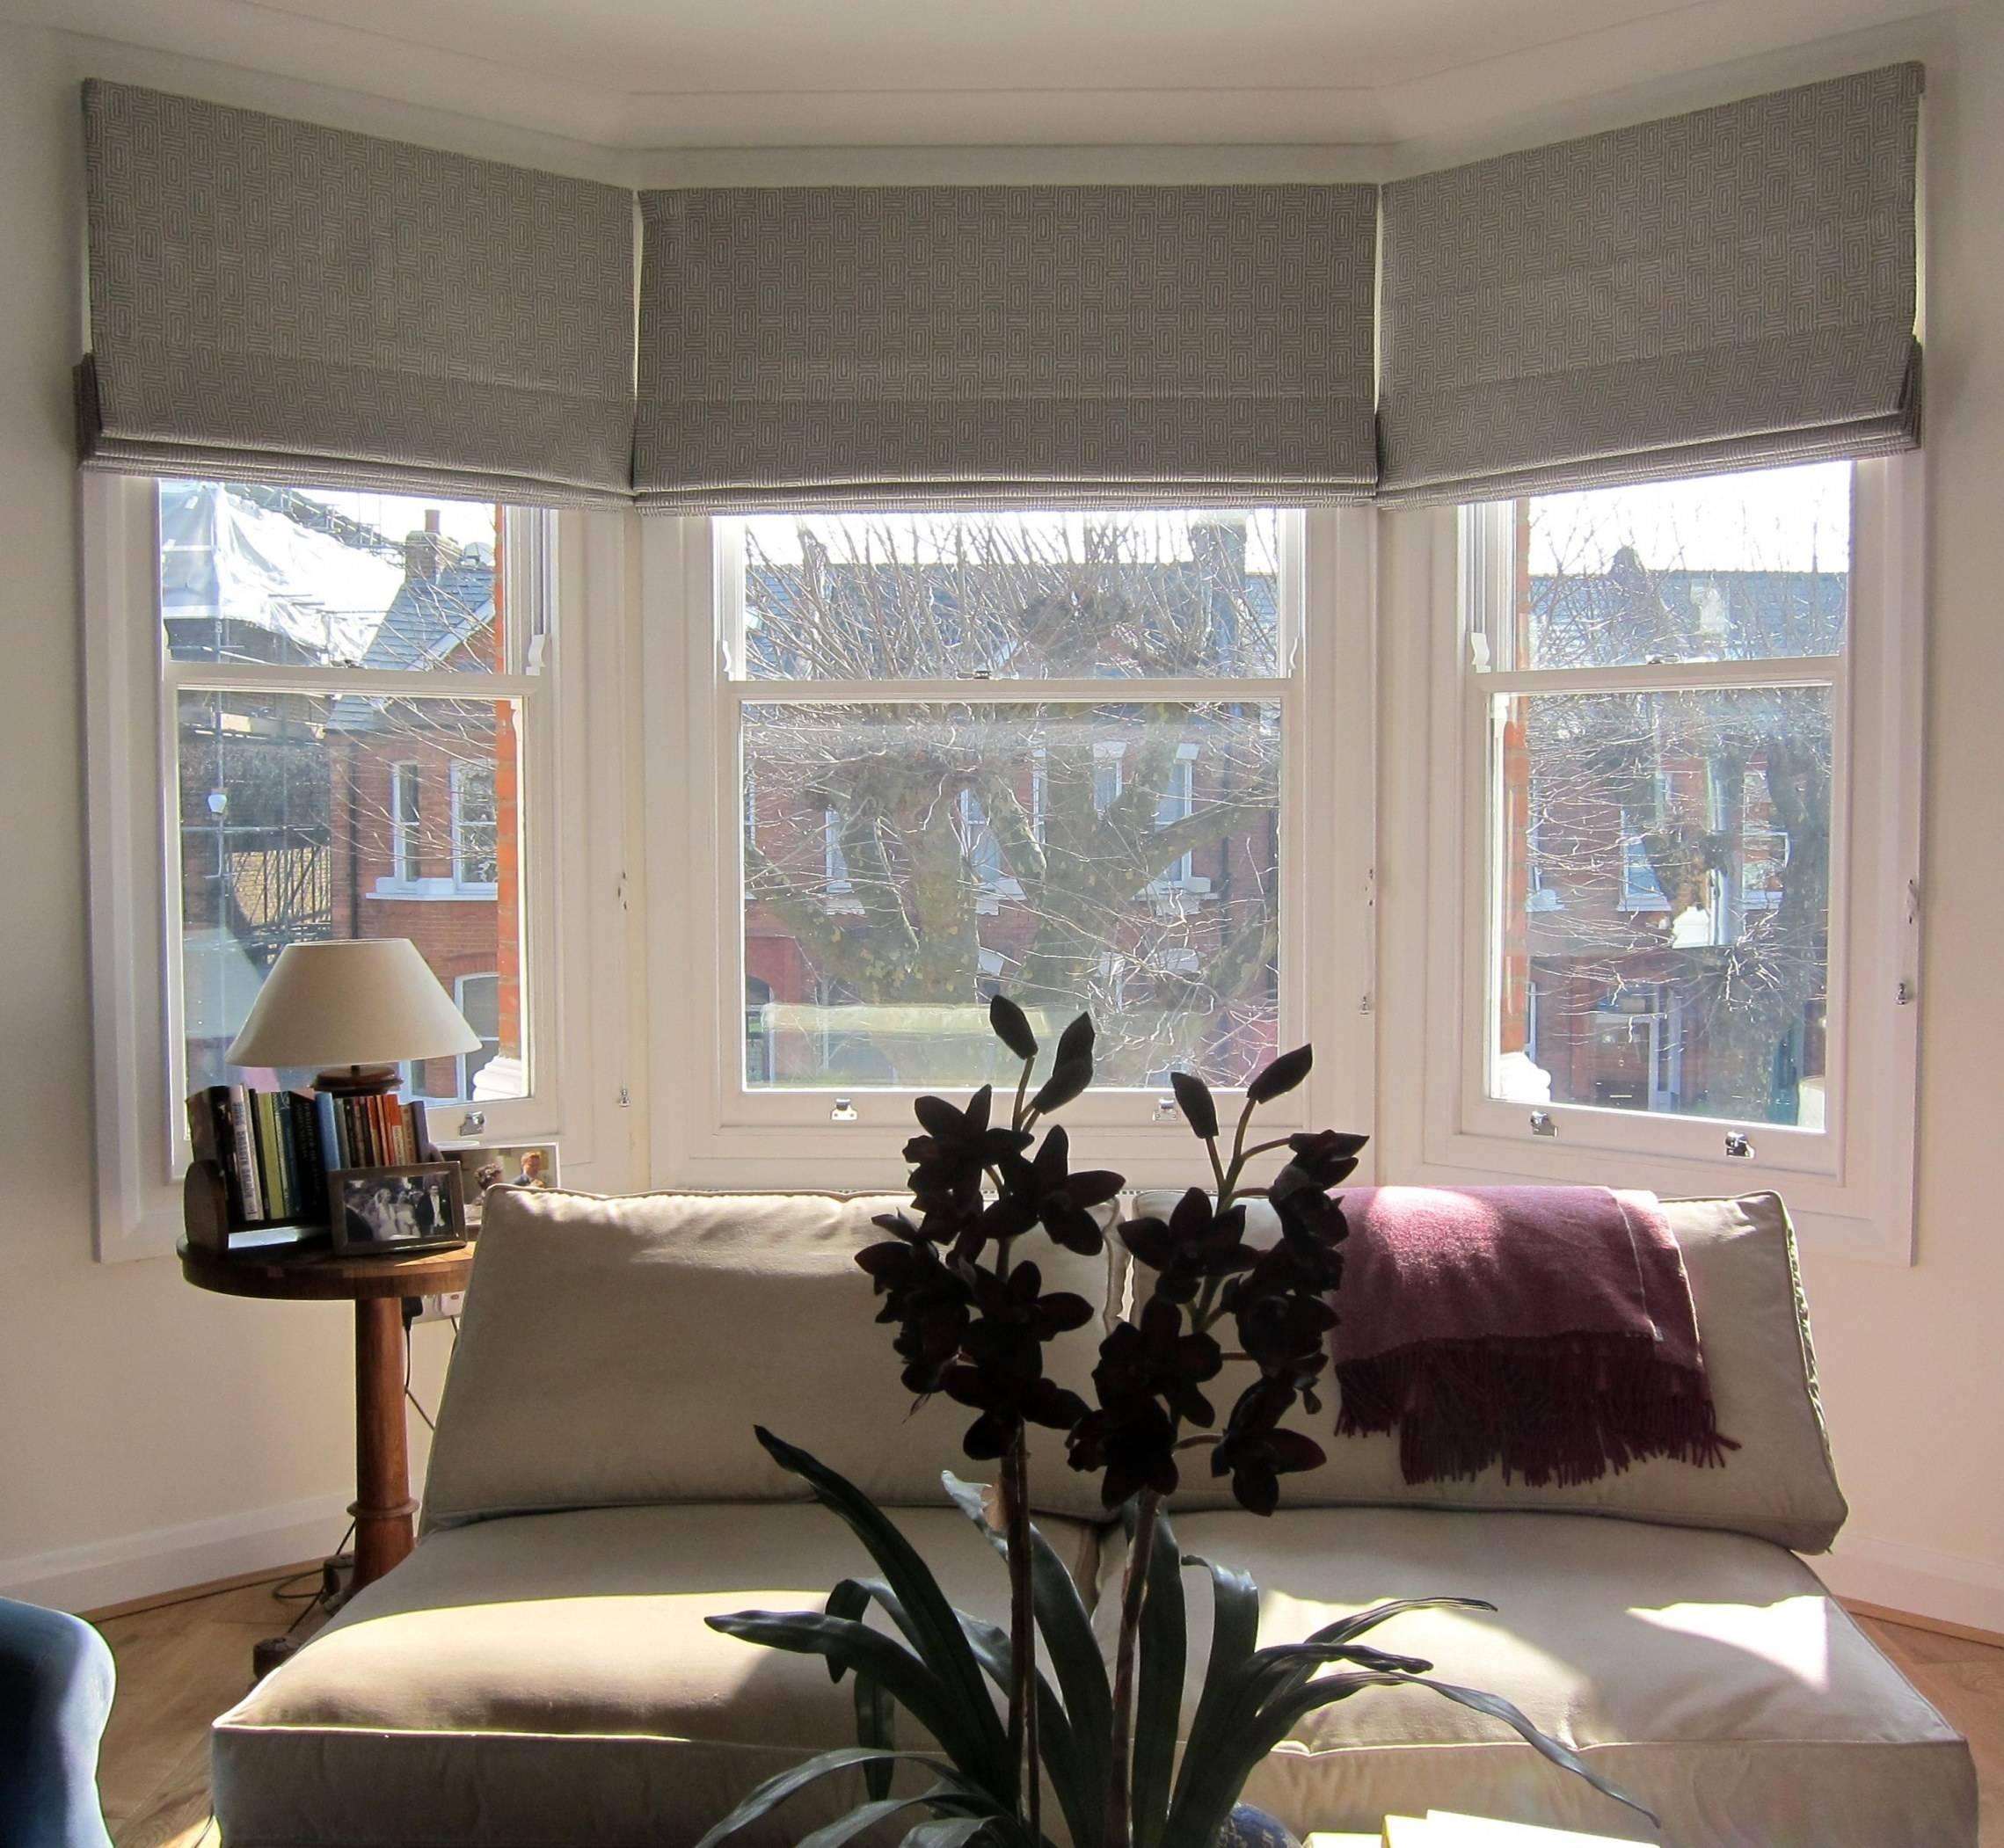 bay window valance ideas 14 bay window ideas that will pop bay window of bay window valance ideas